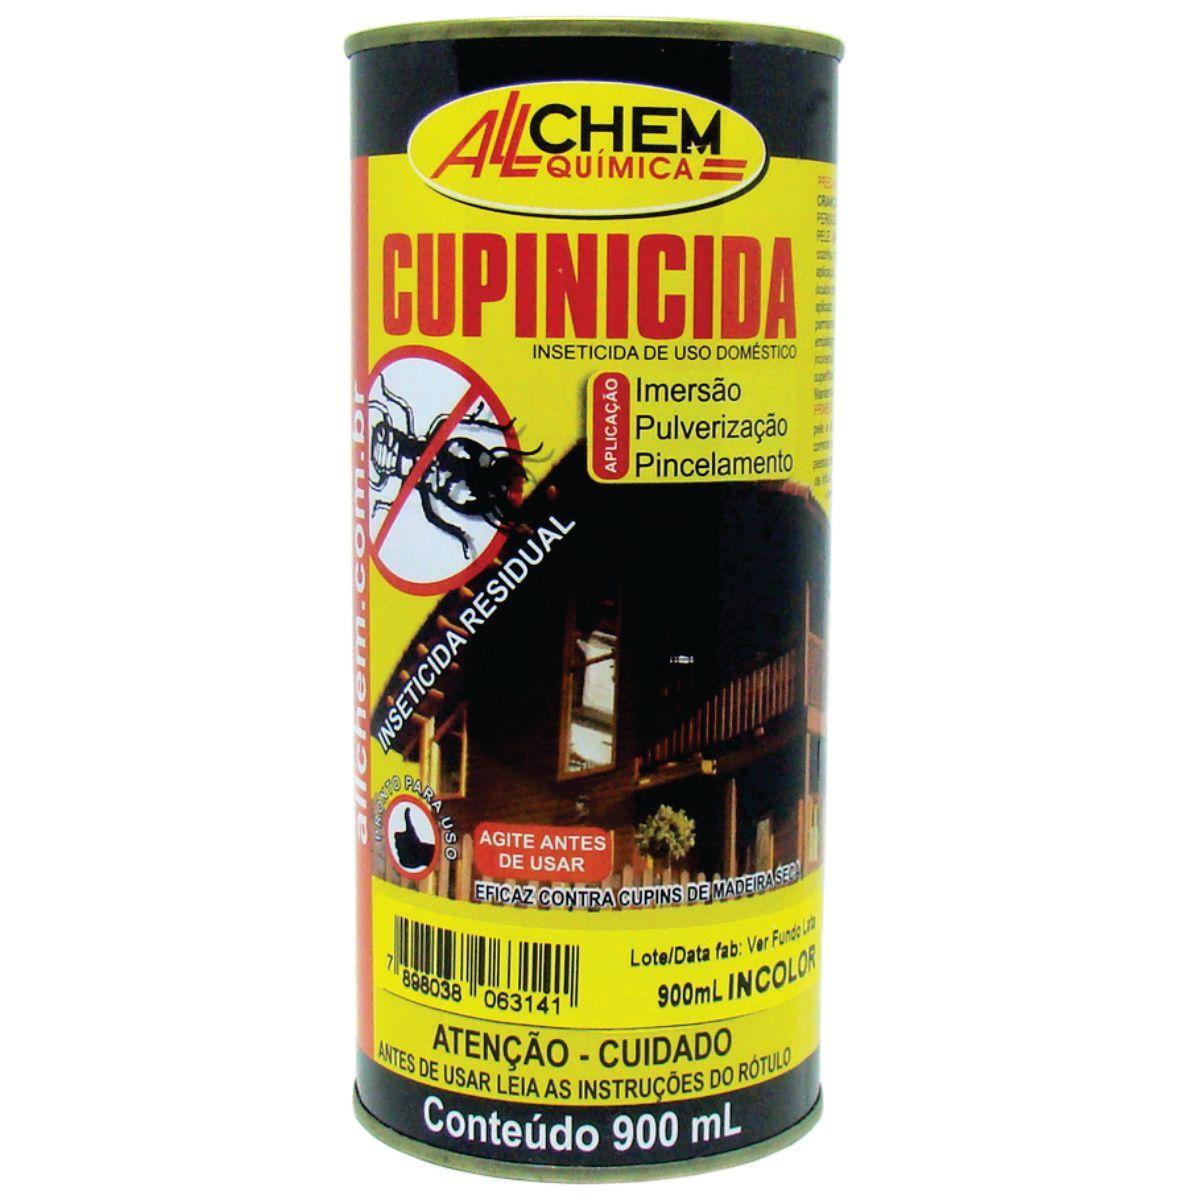 allchem-quimica-cupinicida